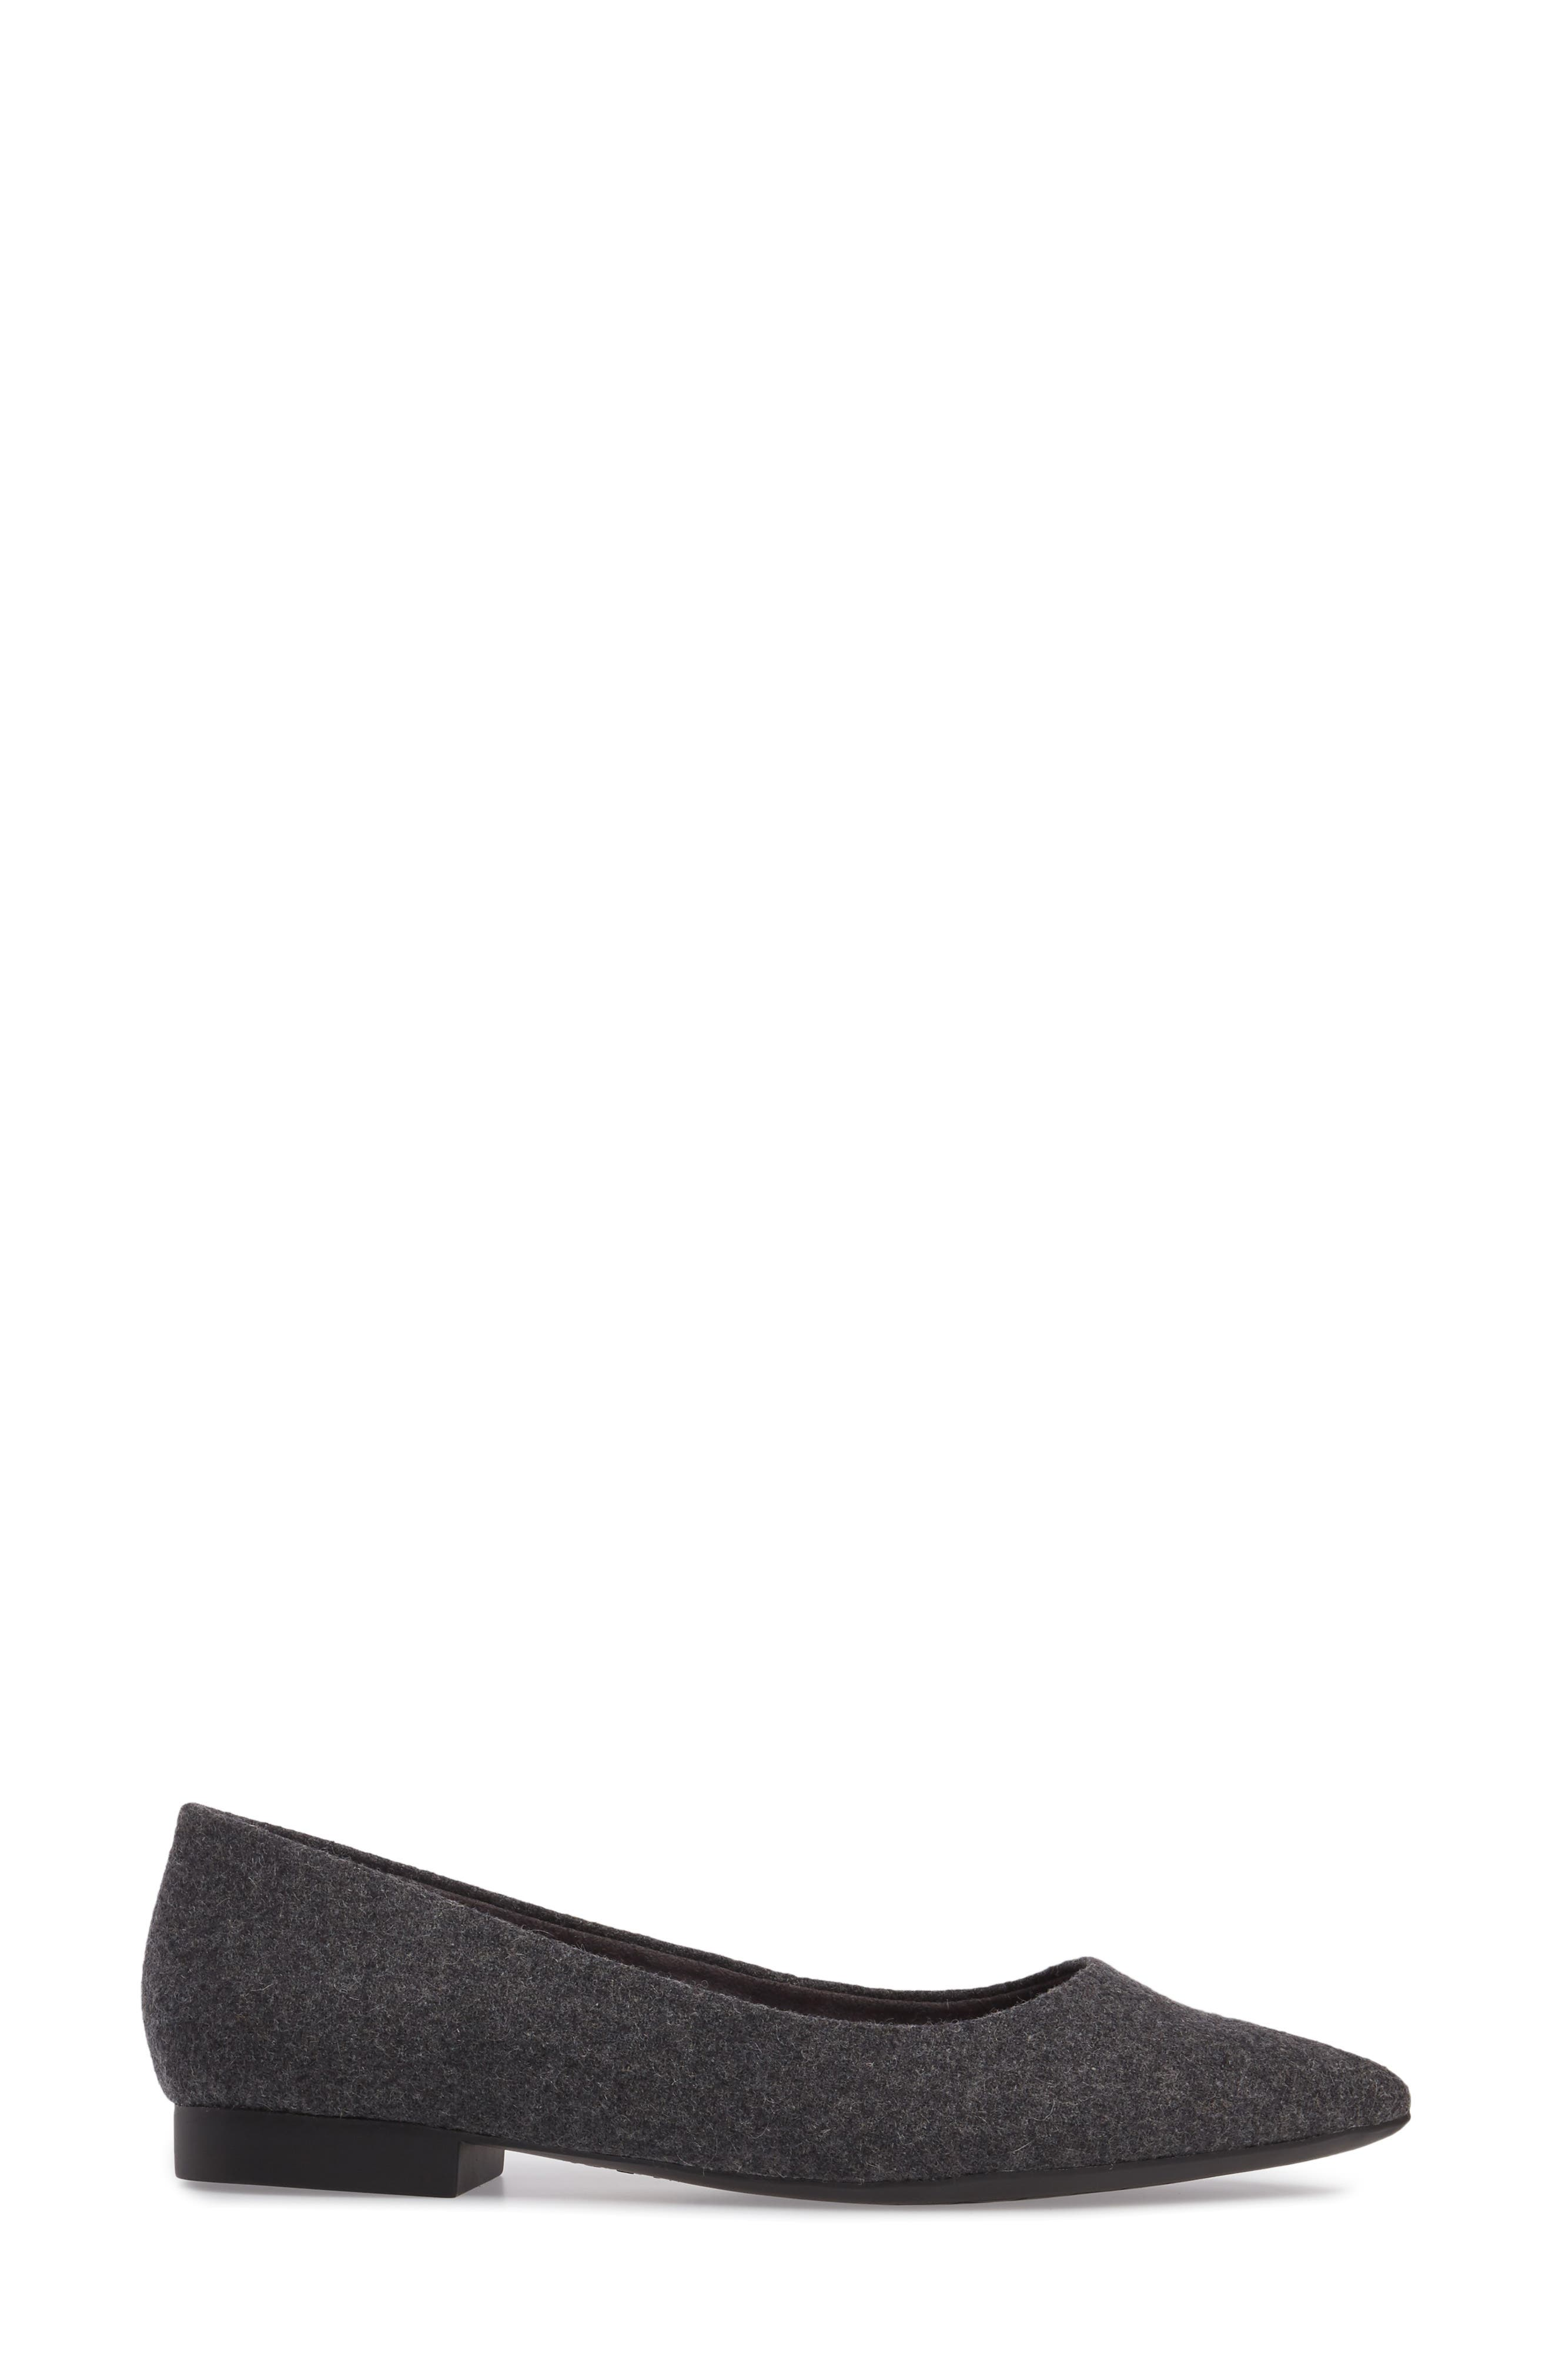 BELLA VITA, 'Vivien' Pointy Toe Flat, Alternate thumbnail 3, color, GREY FLANNEL FABRIC